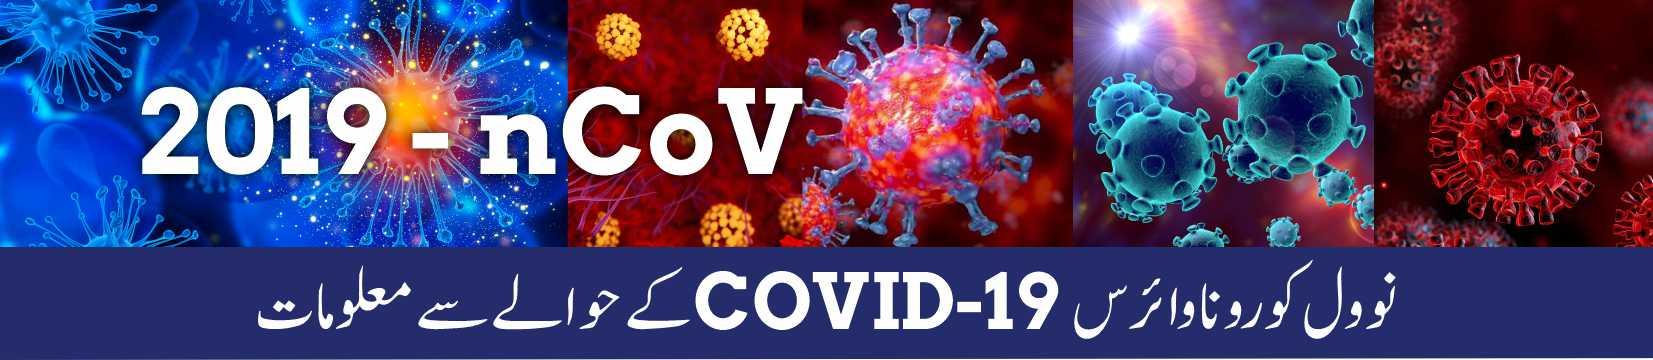 COVID 19 banner1